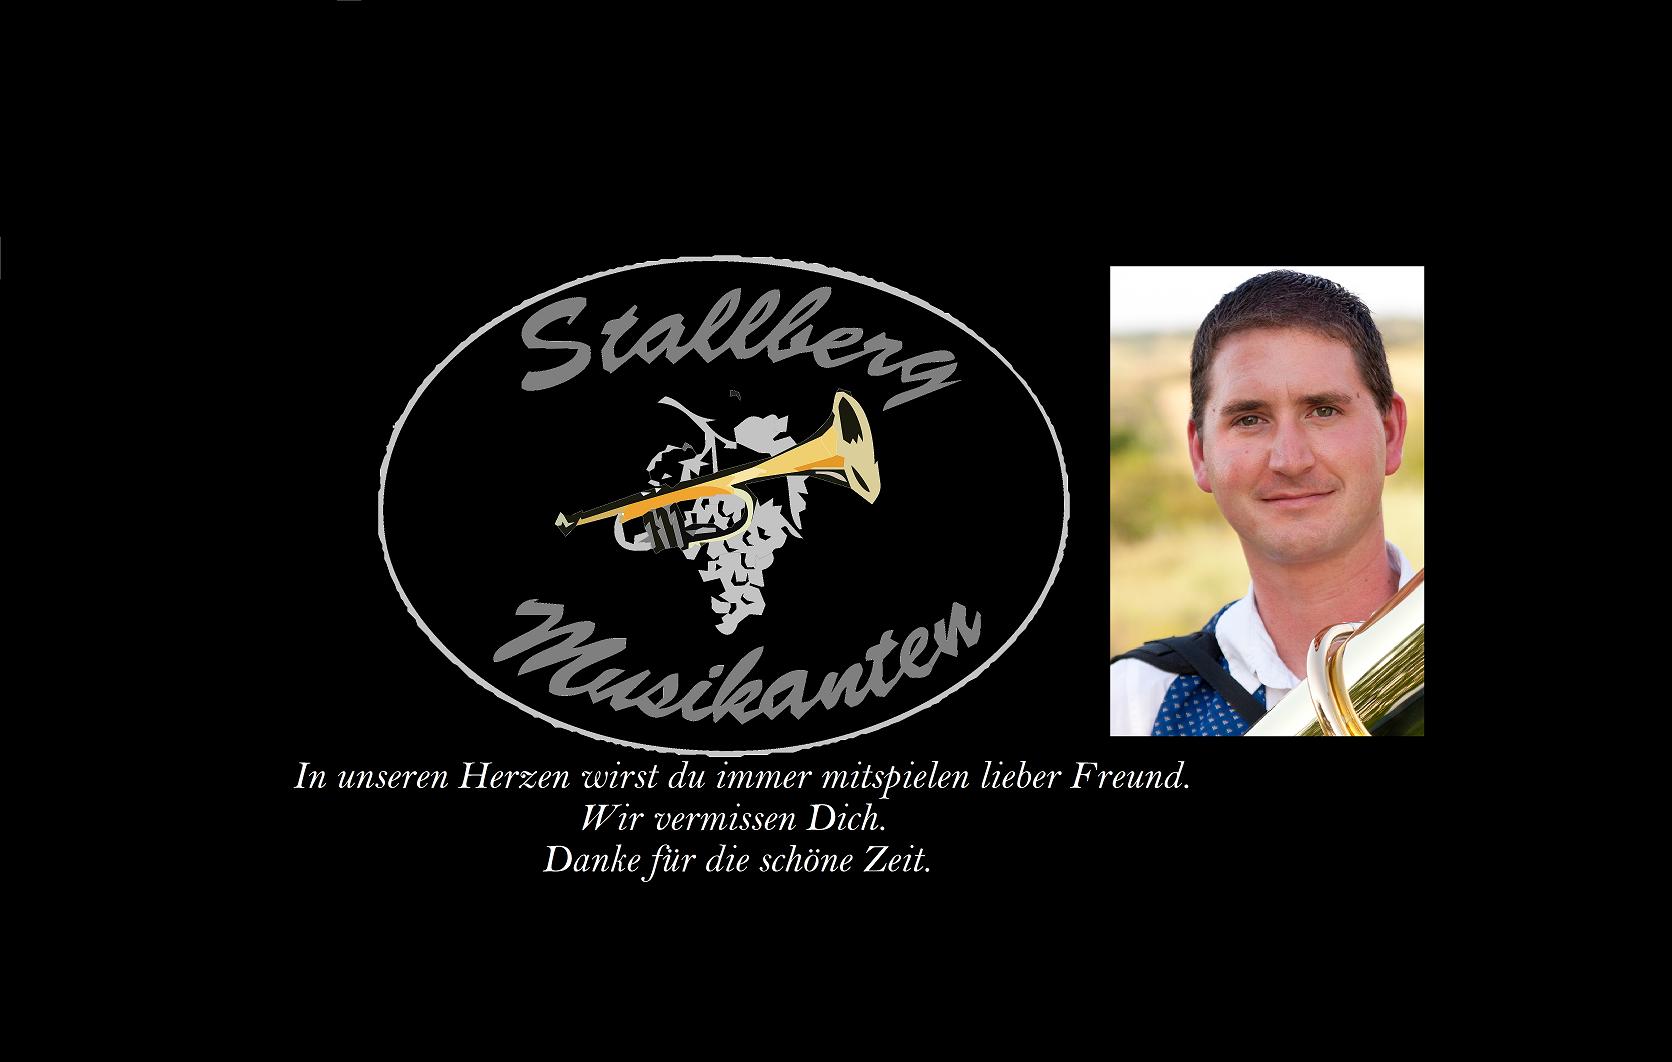 stallberg logo transparent traurig 7 homepage